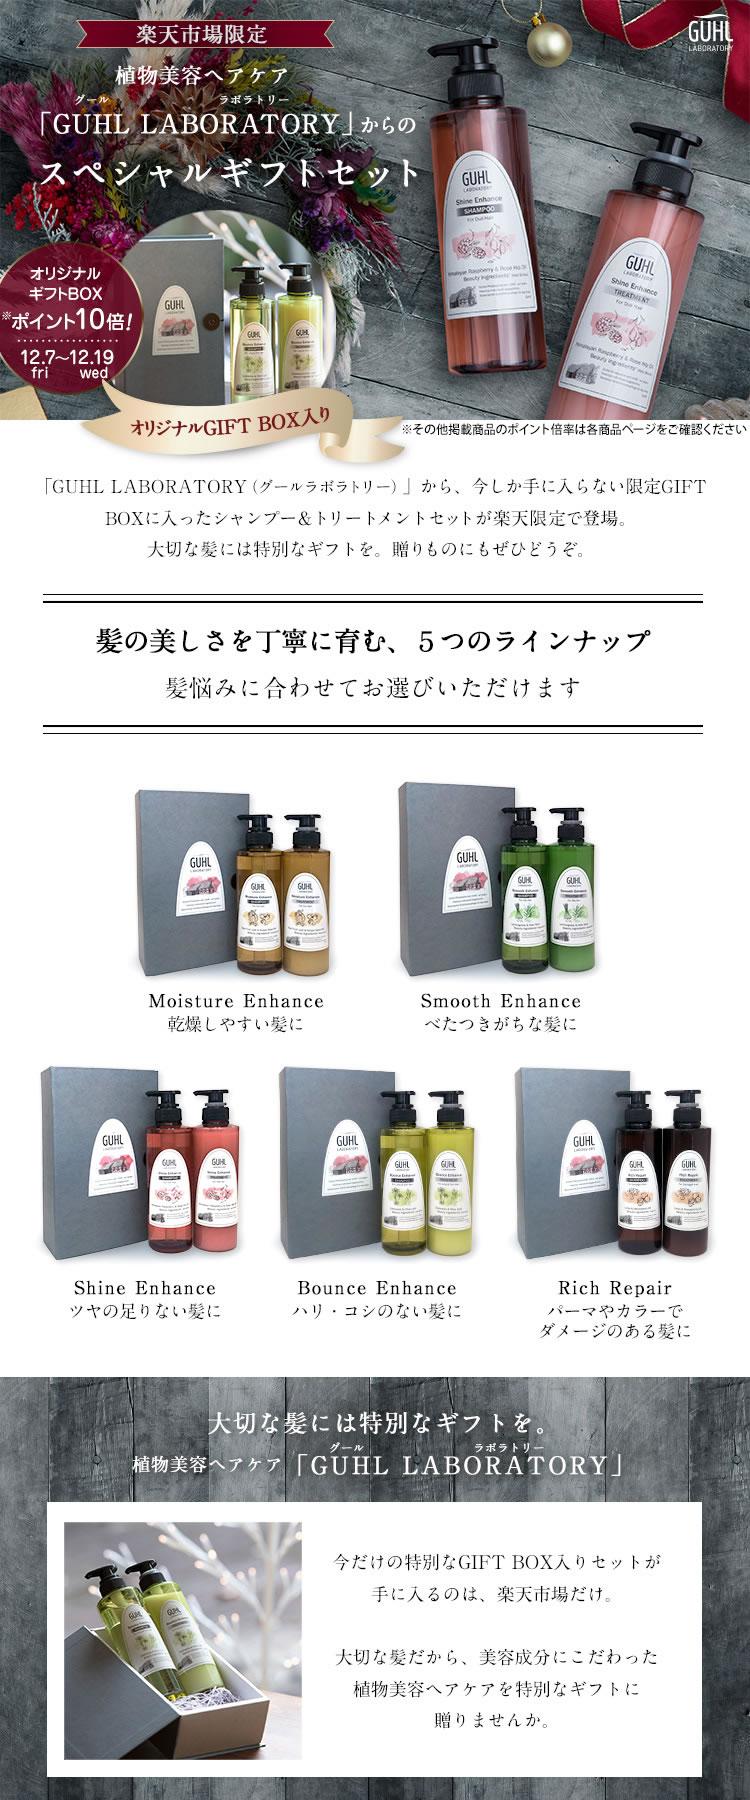 GUHL 楽天市場限定 植物美容ヘアケア スペシャルギフトセット